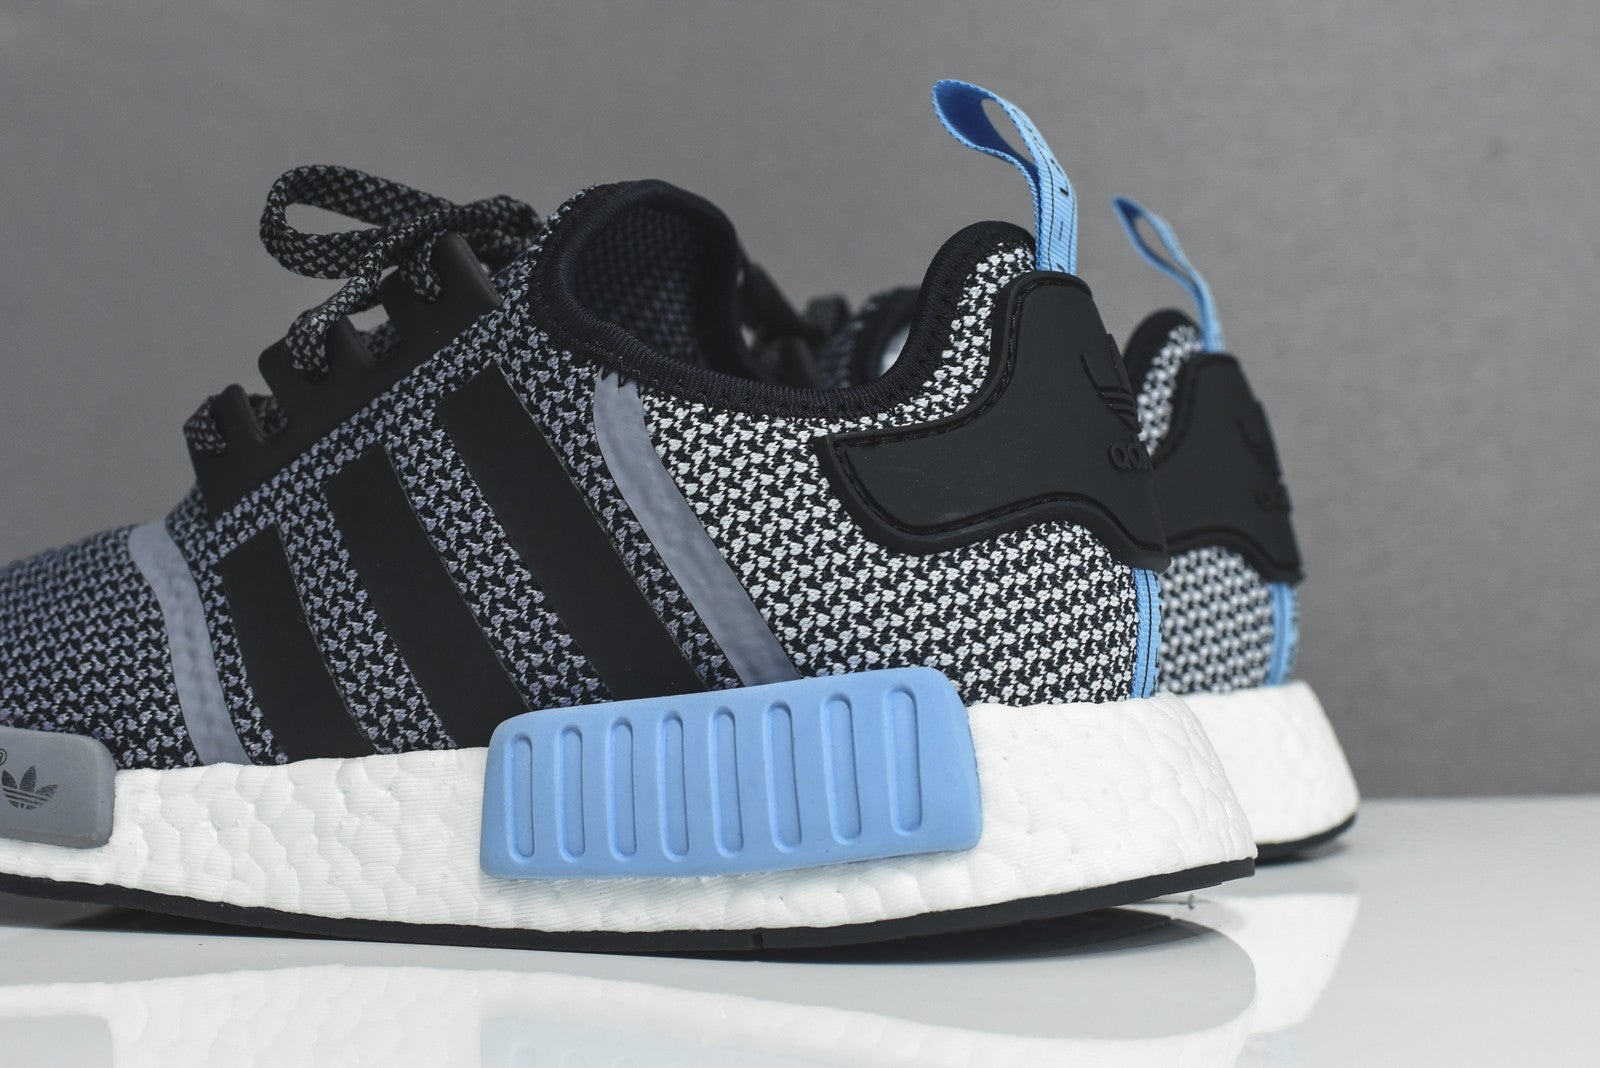 lifitd adidas nmd grey blue Buy authentic designer